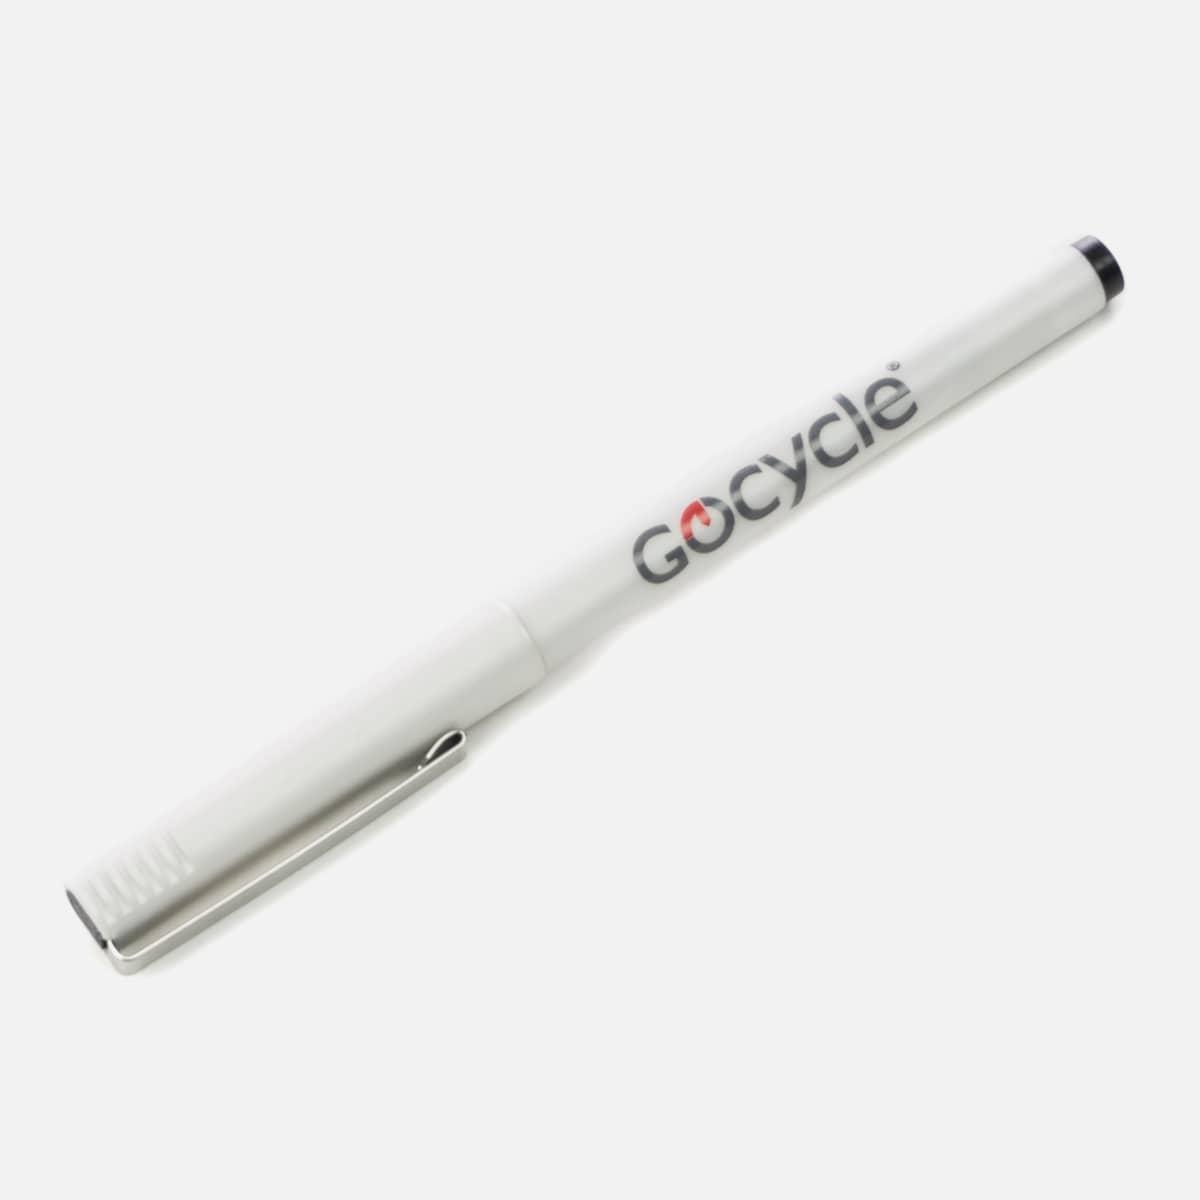 Gocycle Pen in WHITE